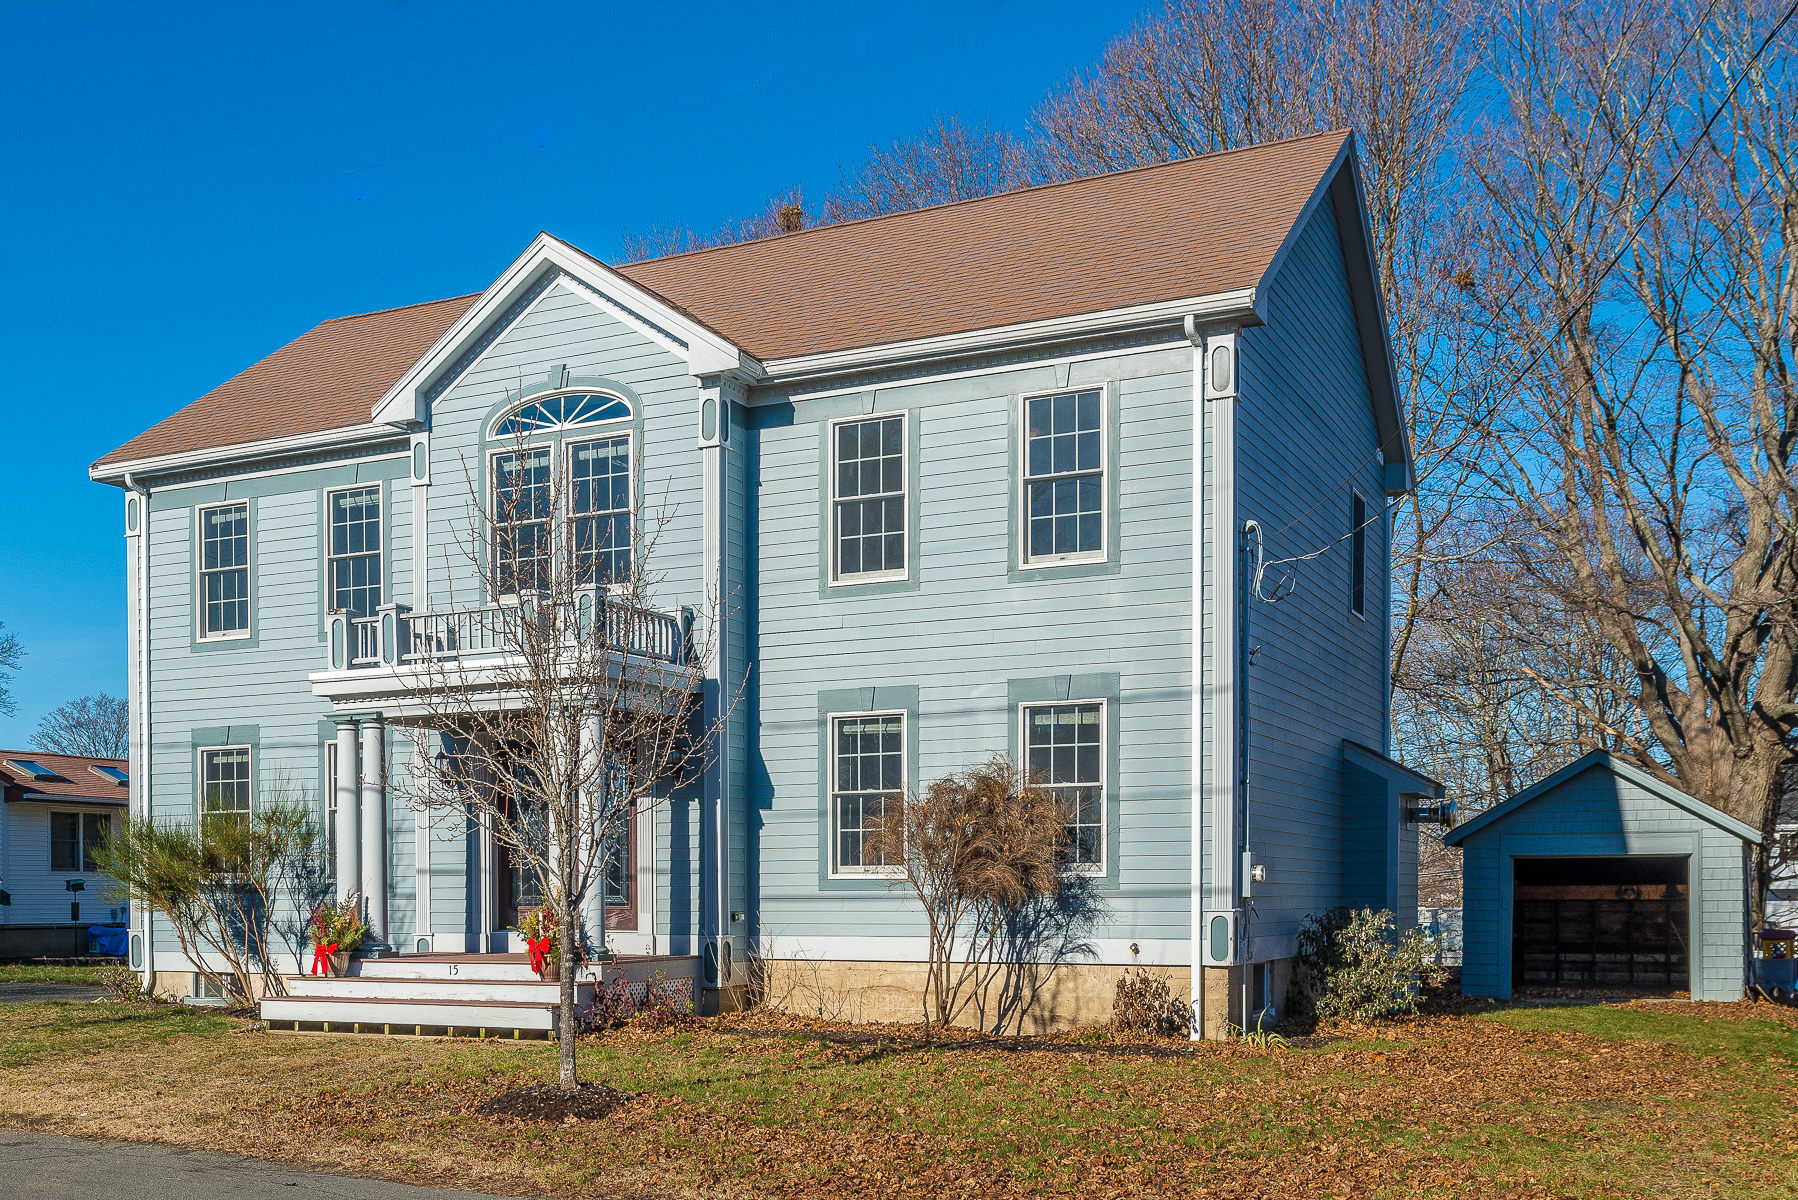 Casa Unifamiliar por un Venta en Beautifully Renovated Colonial Located Near Major Highways 15 Appleton Street Danvers, Massachusetts, 01923 Estados Unidos